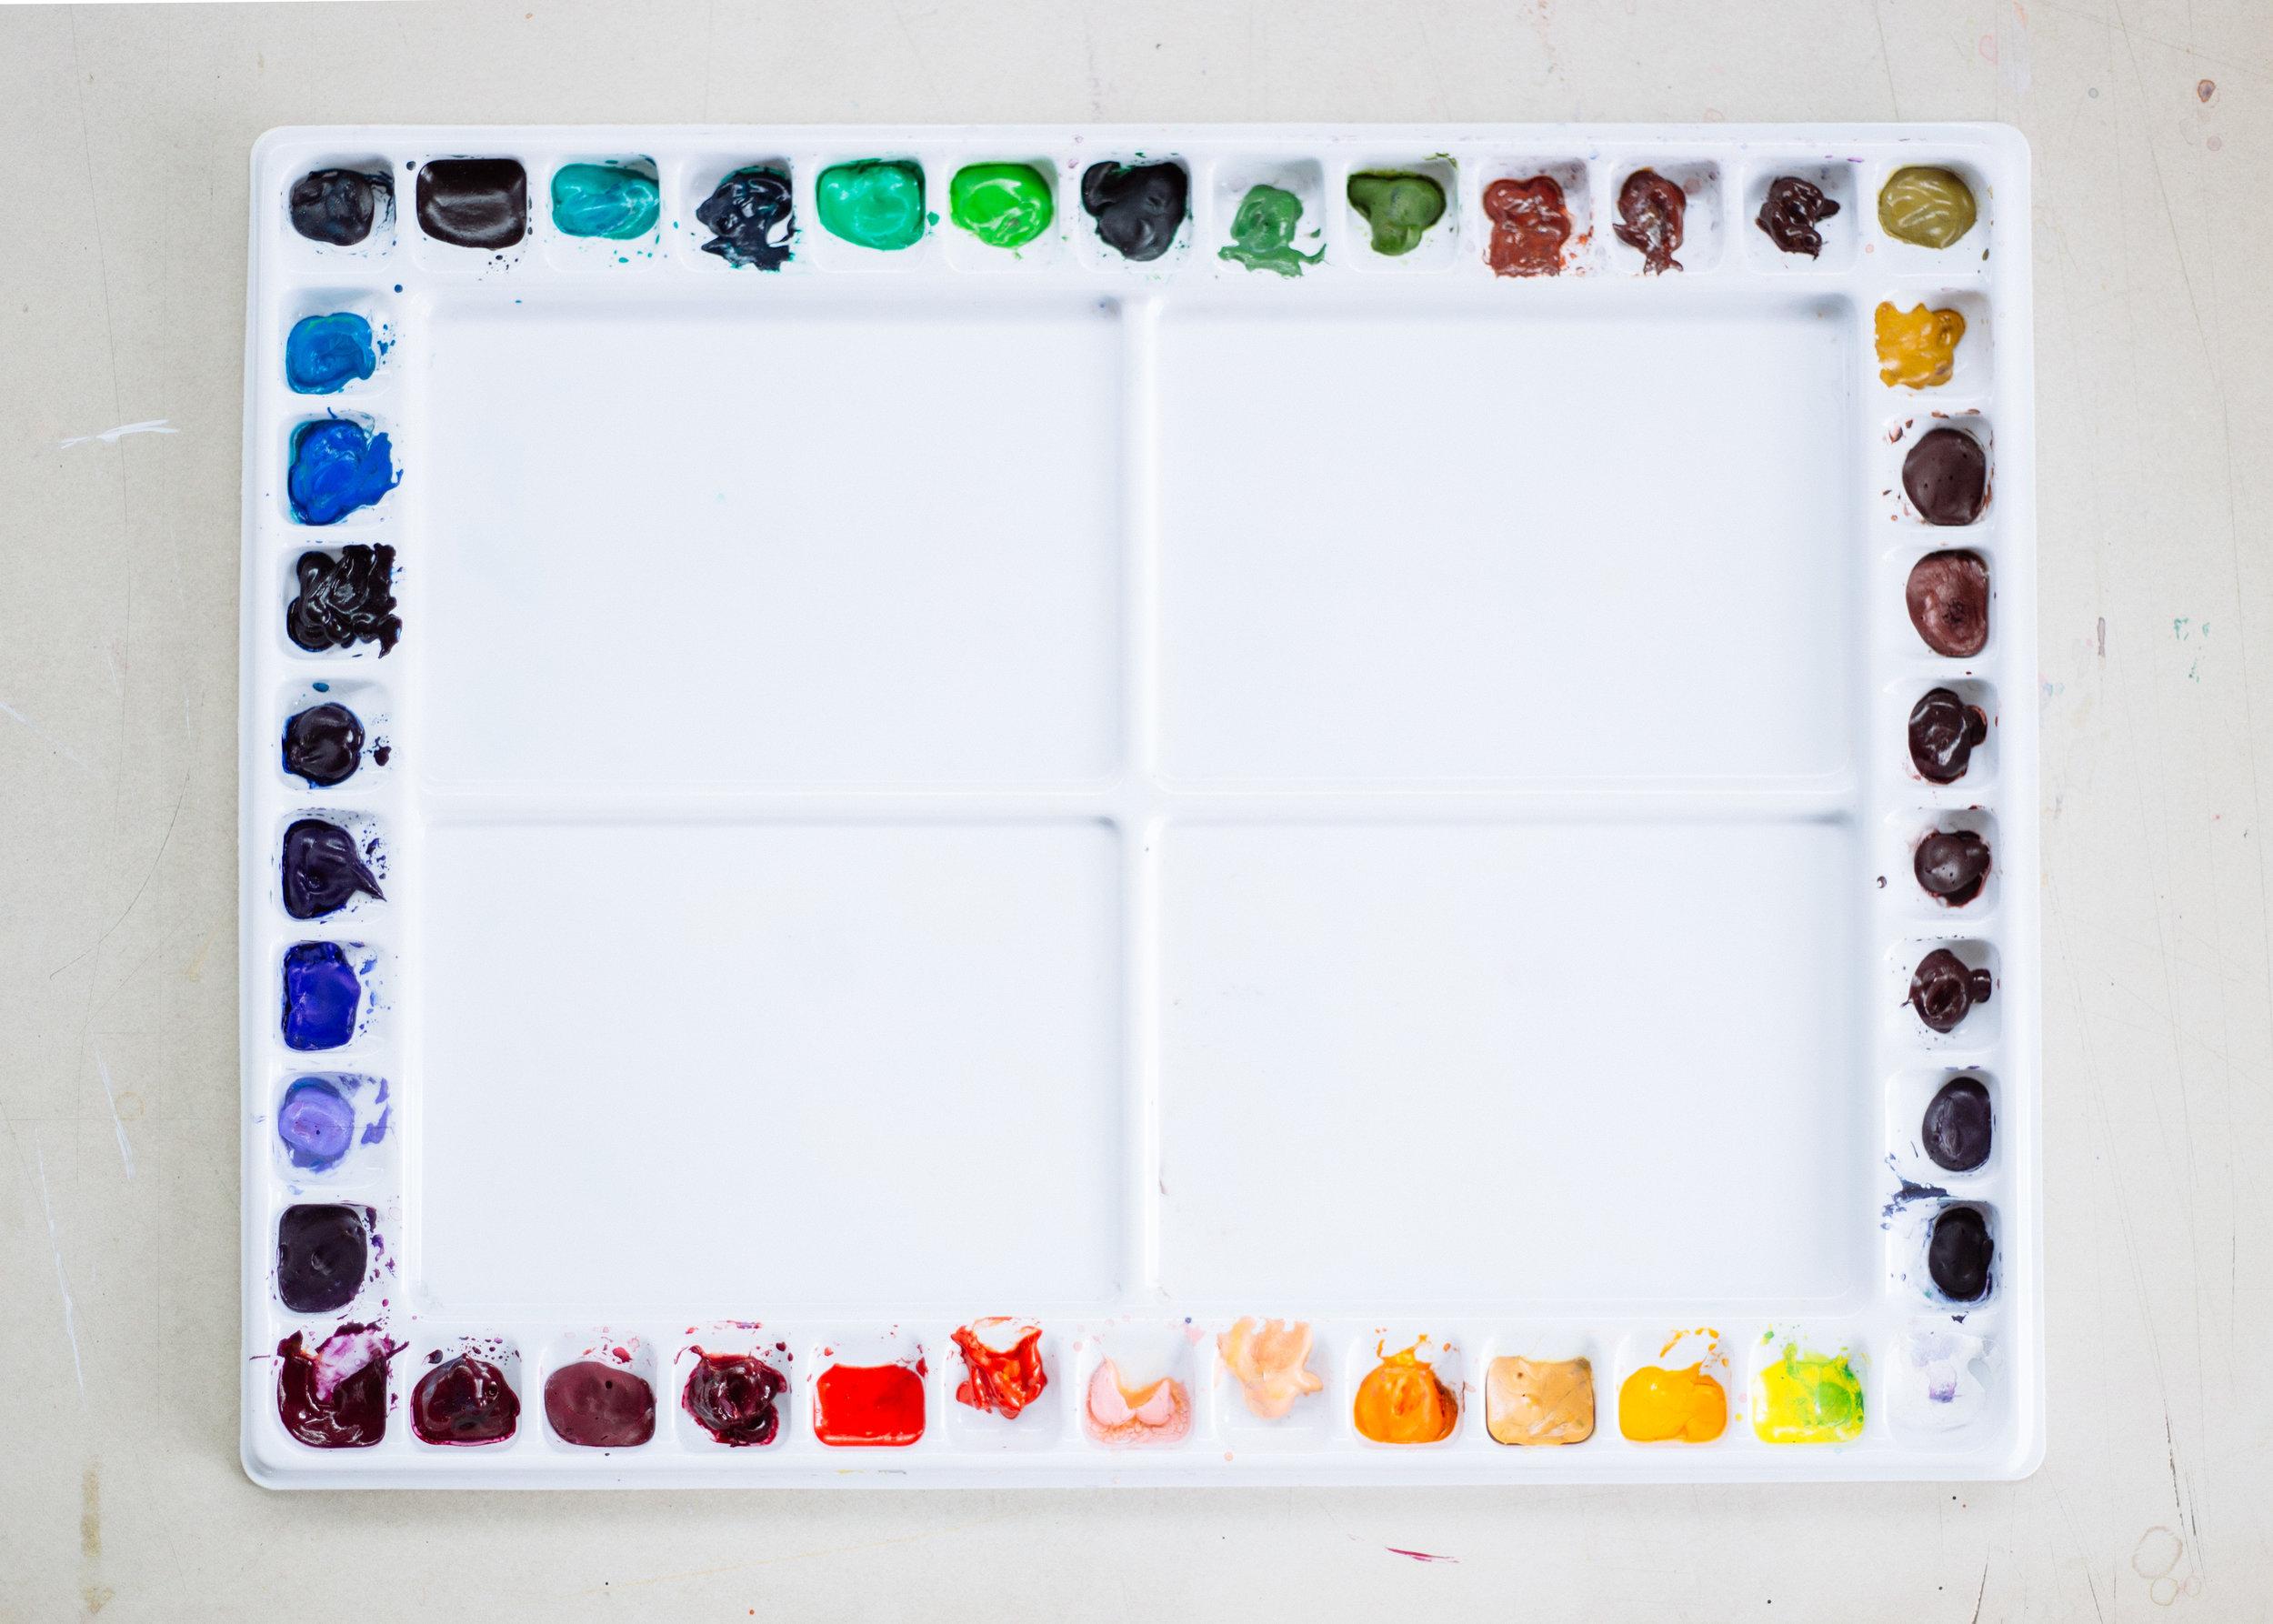 watercolor_classes_tutorial_materials_durham_nc_paints.jpg